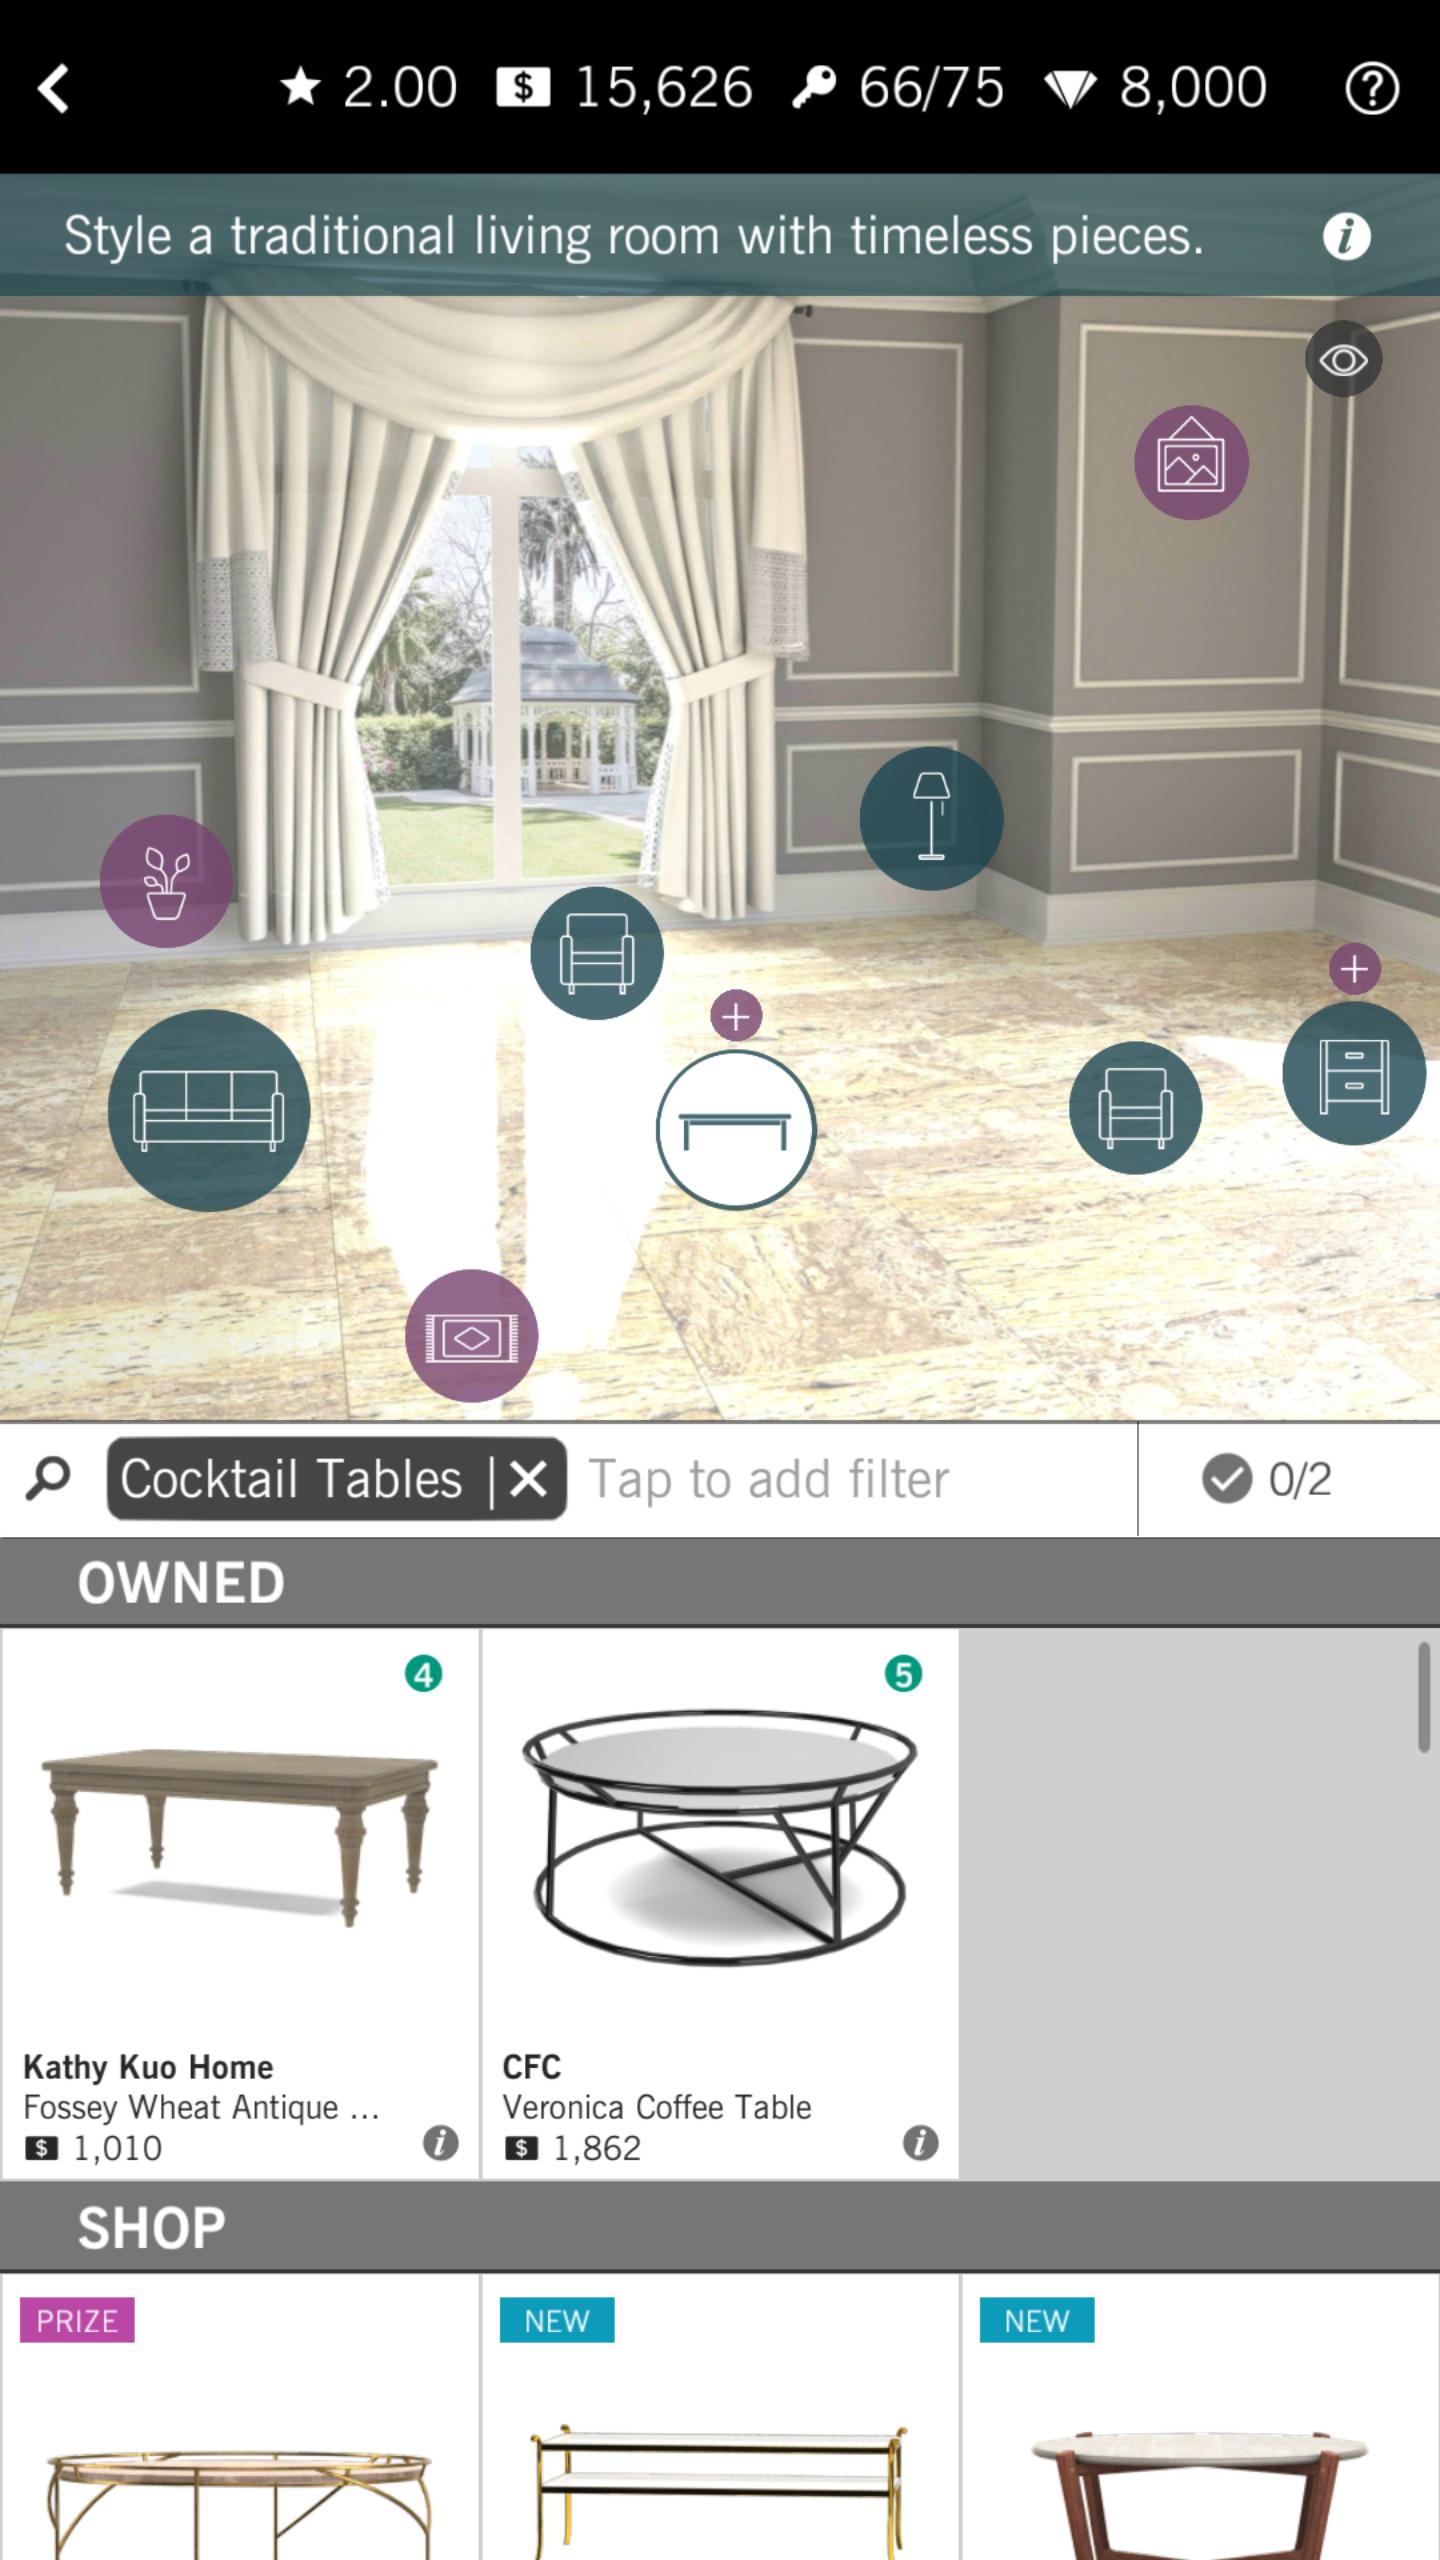 design home guide tips tricks online fanatic screenshot 20161123 154347